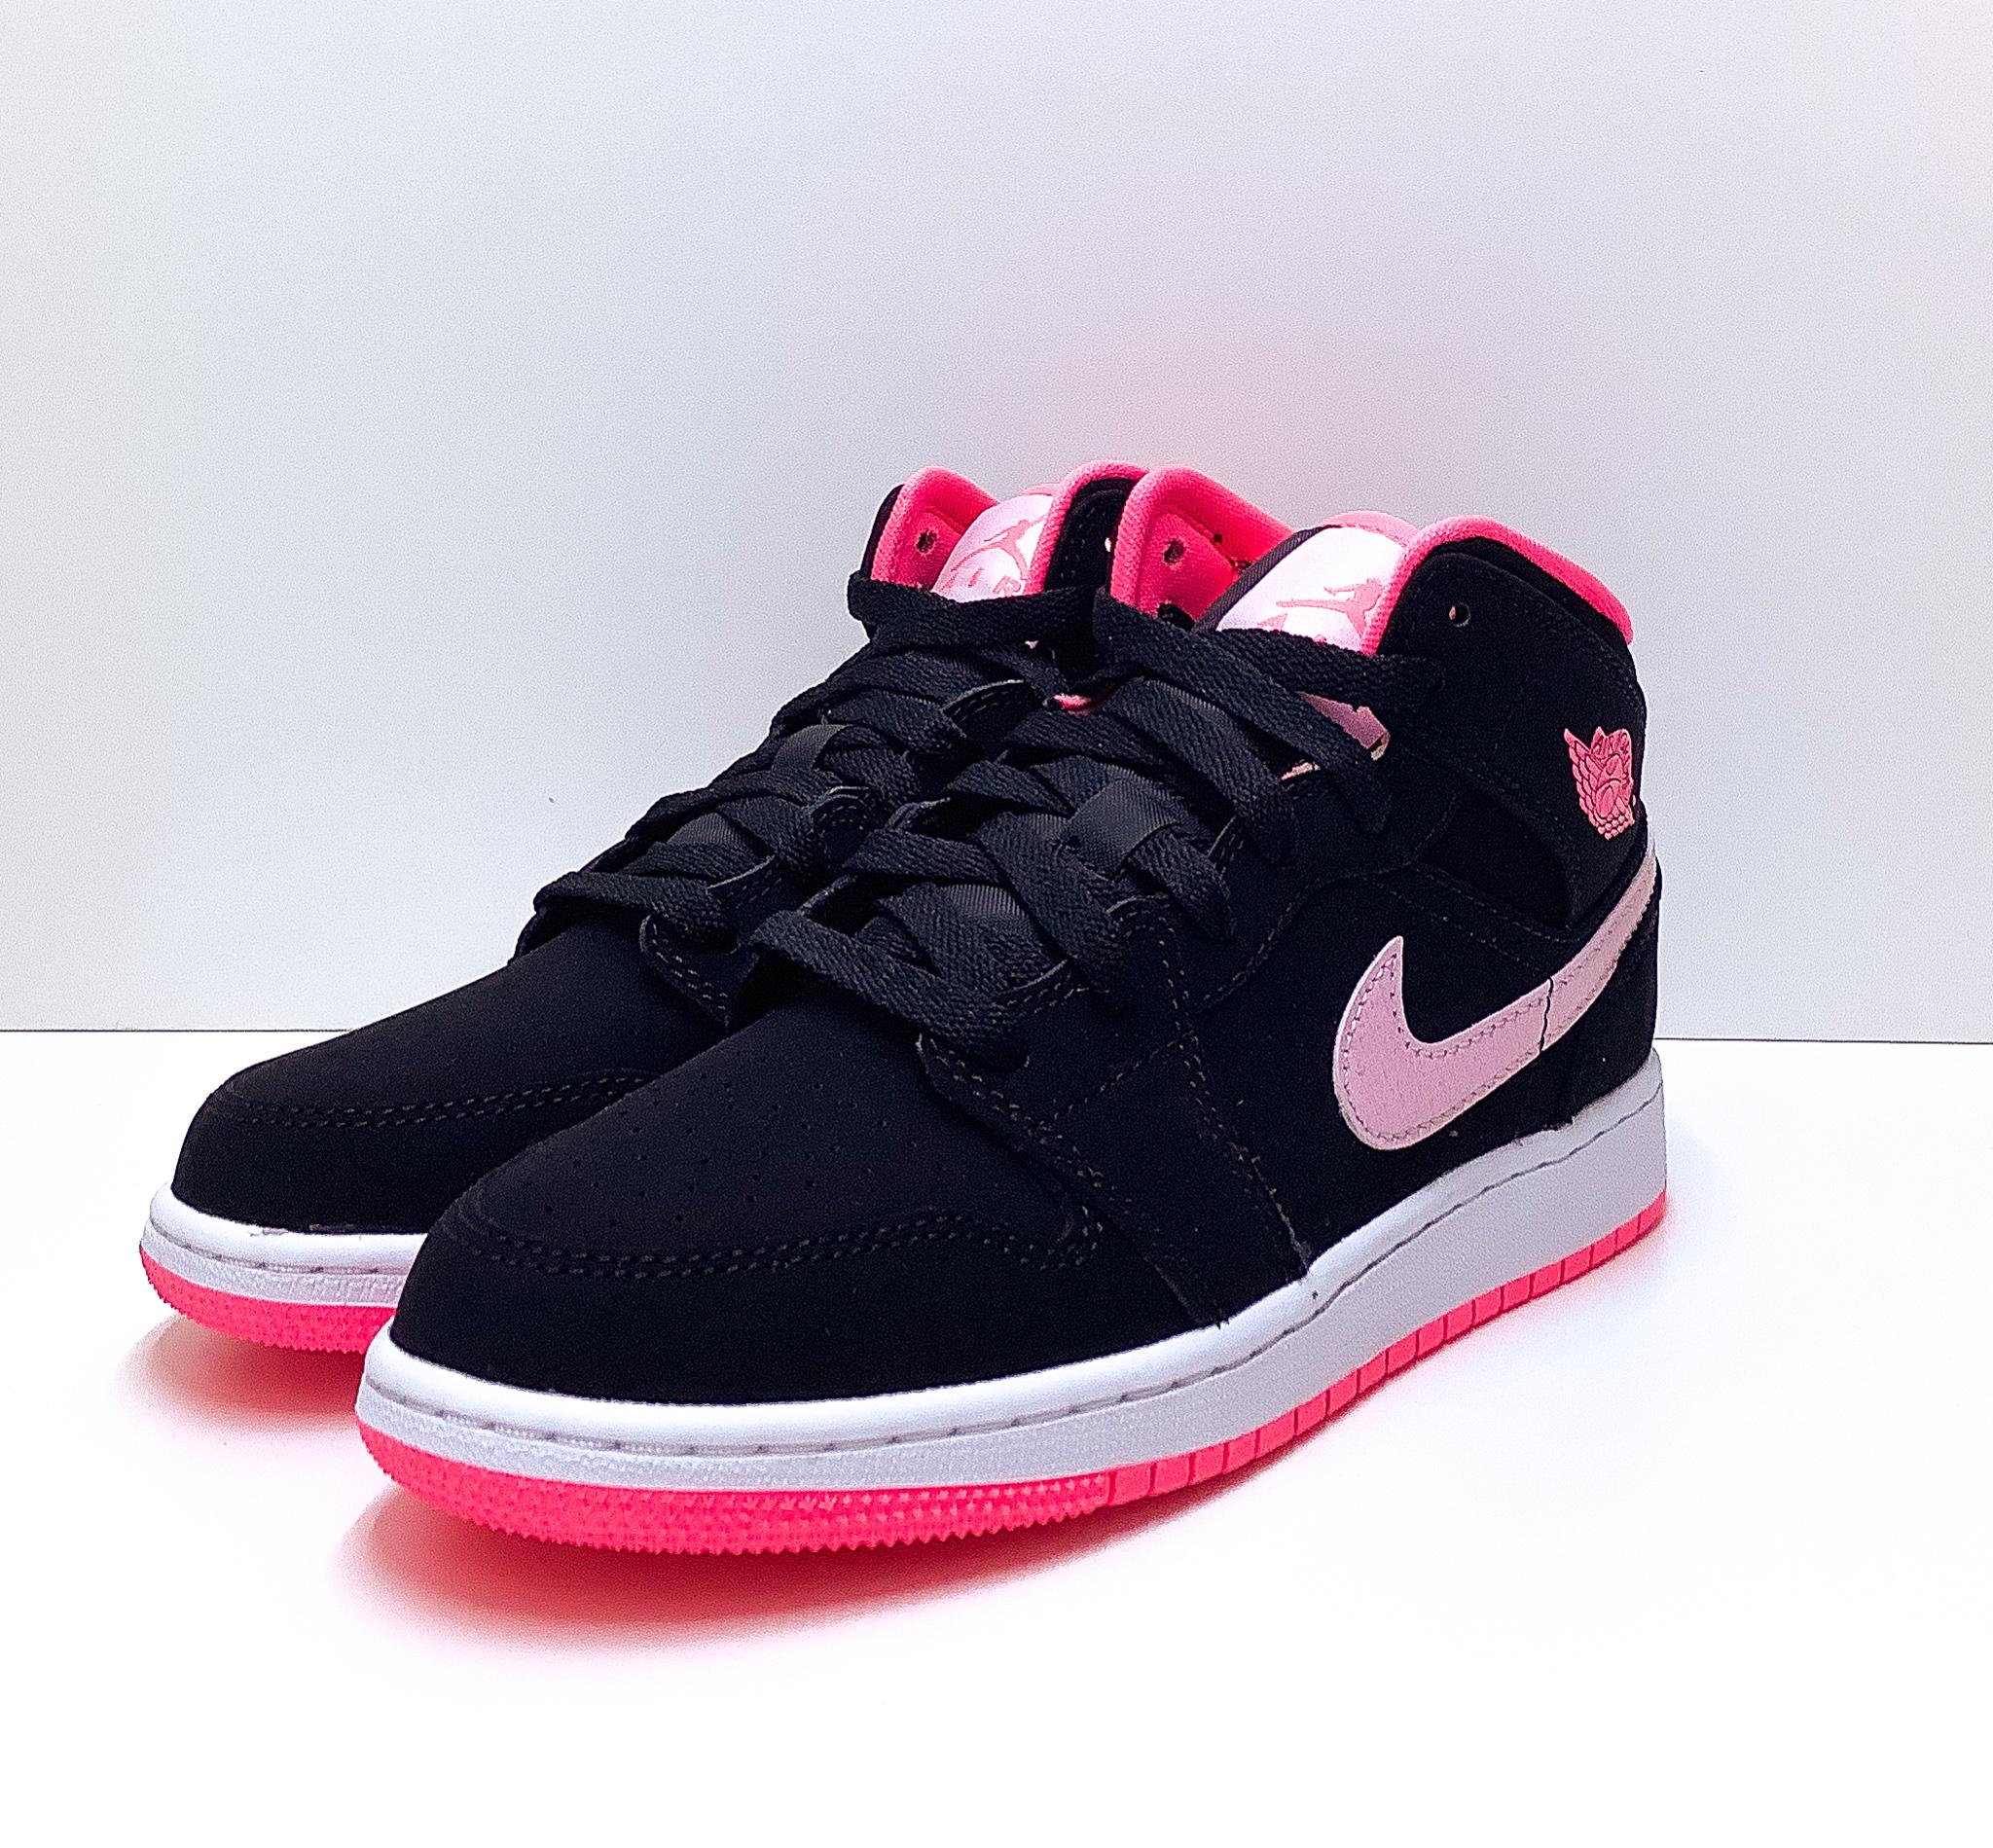 Jordan 1 Mid Black Digital Pink (GS)